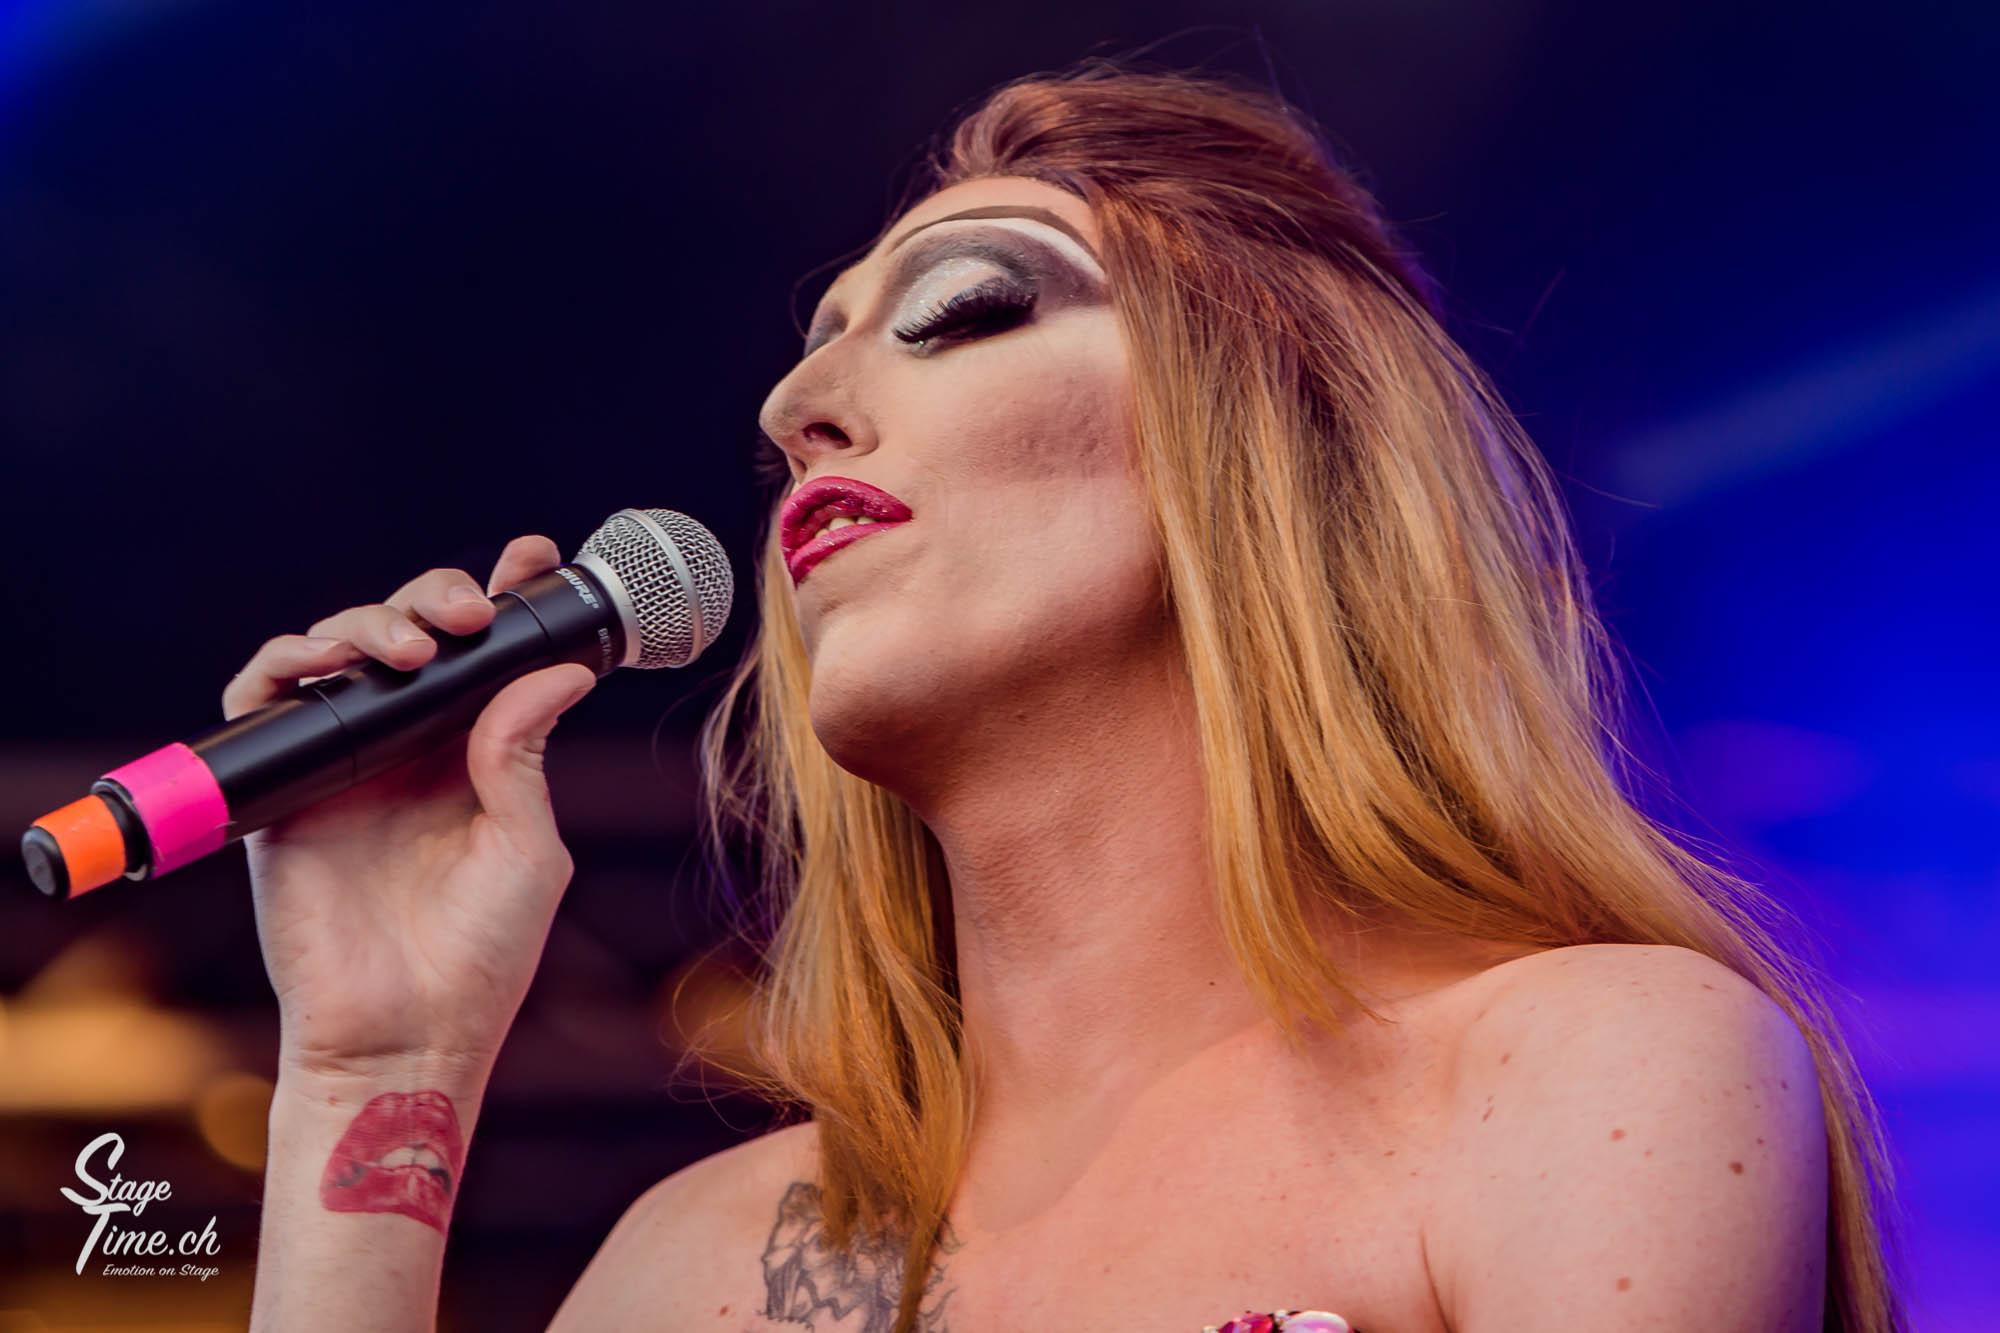 Zurich_Pride_Festival_2018___📷_Christoph_Gurtner___stagetime.ch-23